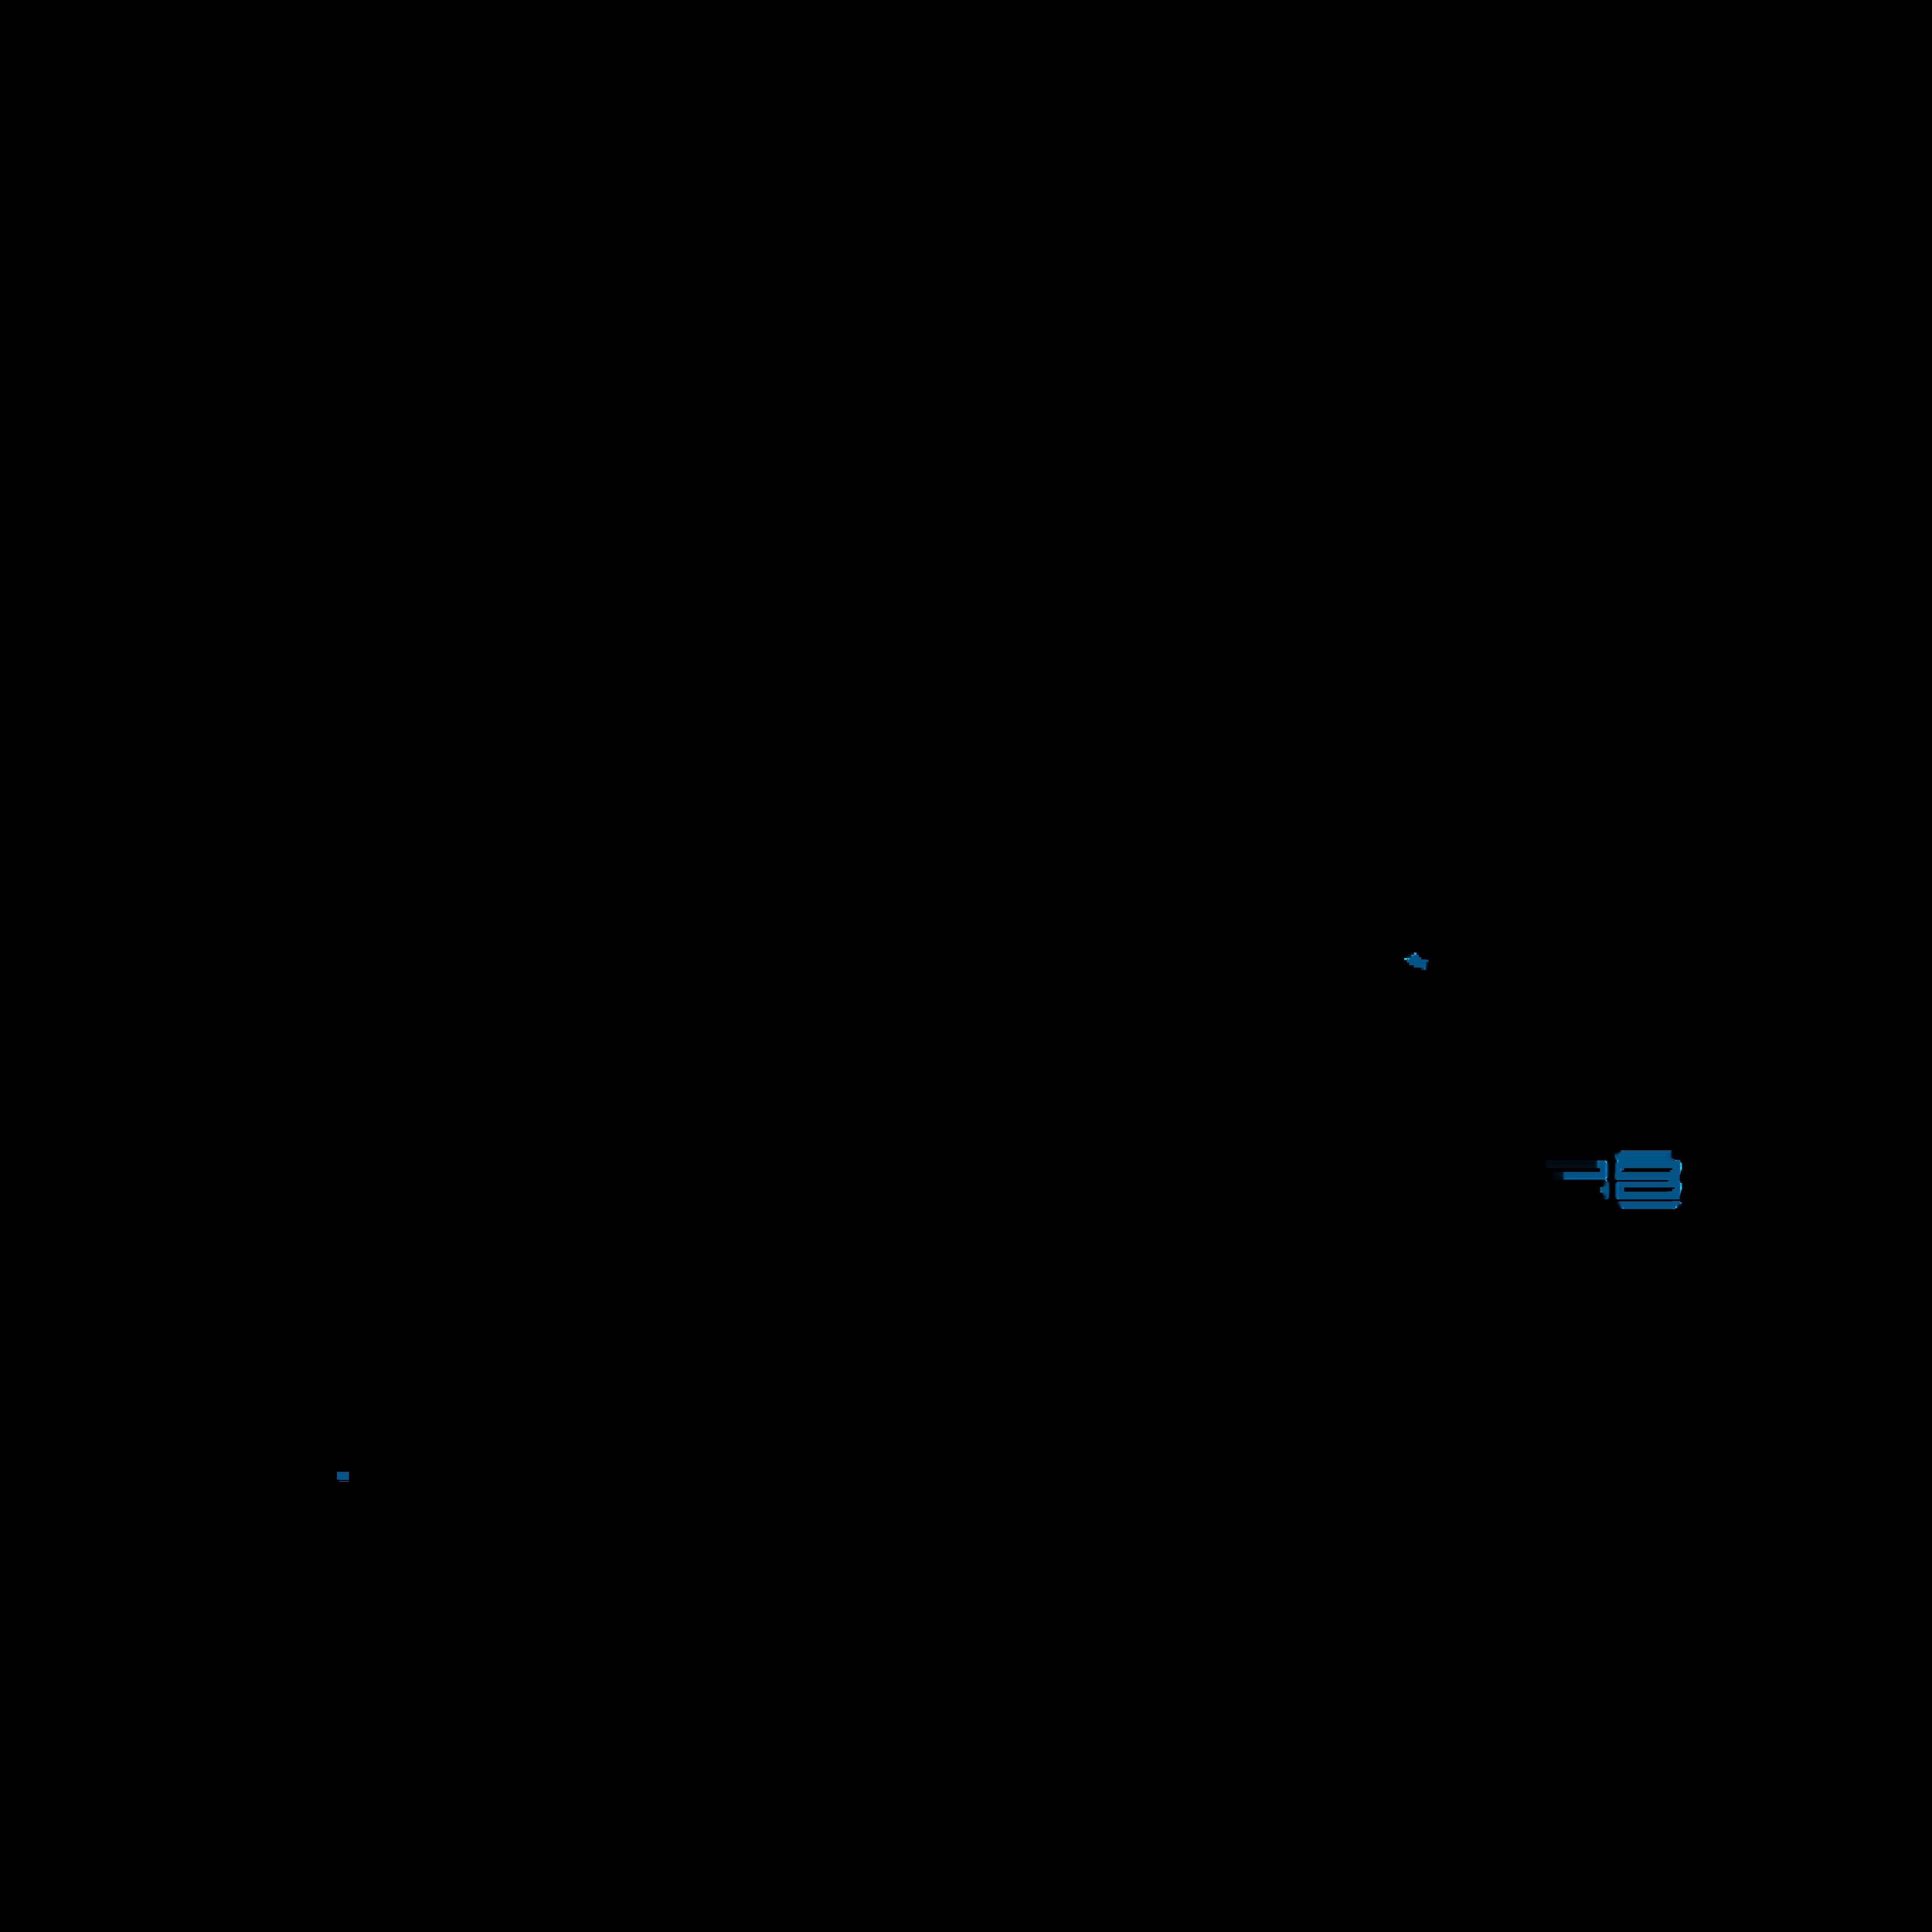 CFX 28 Dimensions